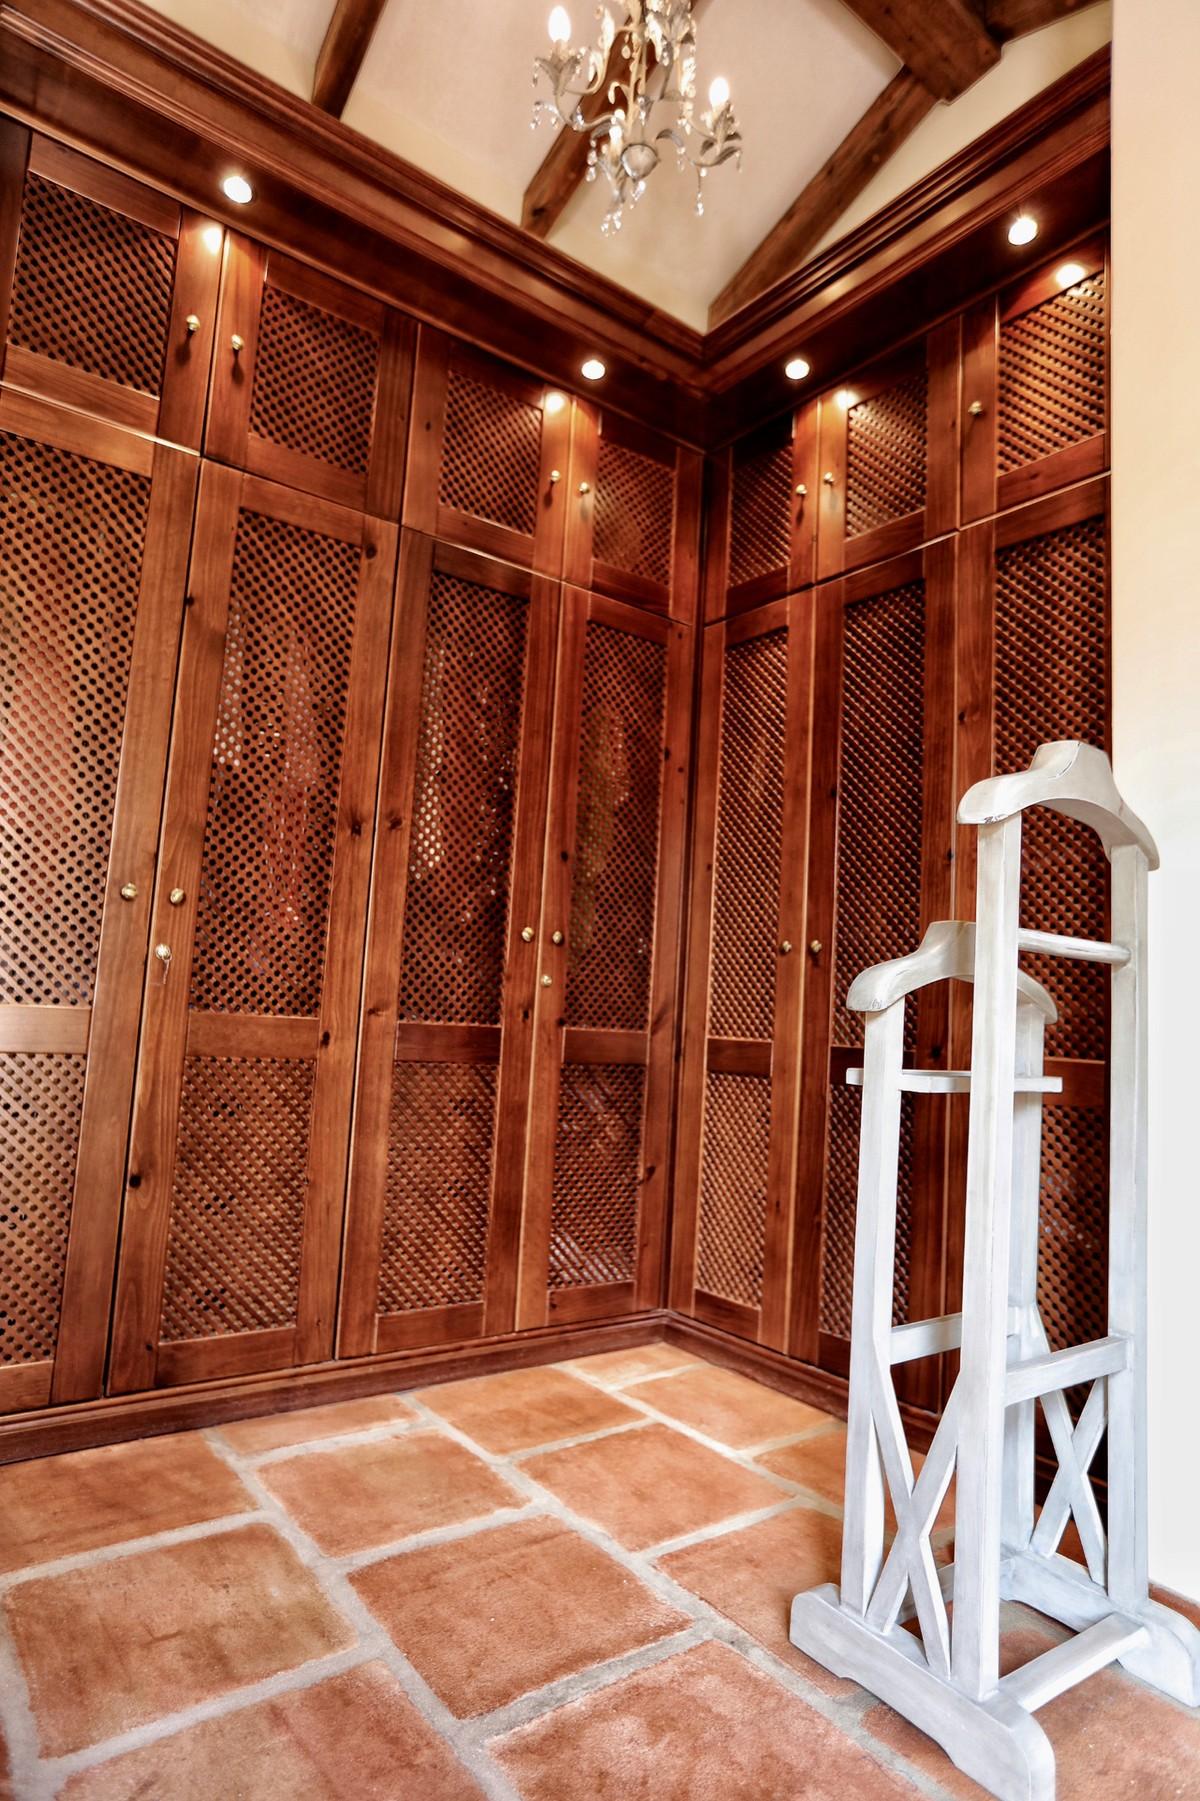 INVESTMENT Opportunity! Large Luxury Detached Villa with Sea Views in Hacienda Las Chapas, Marbella